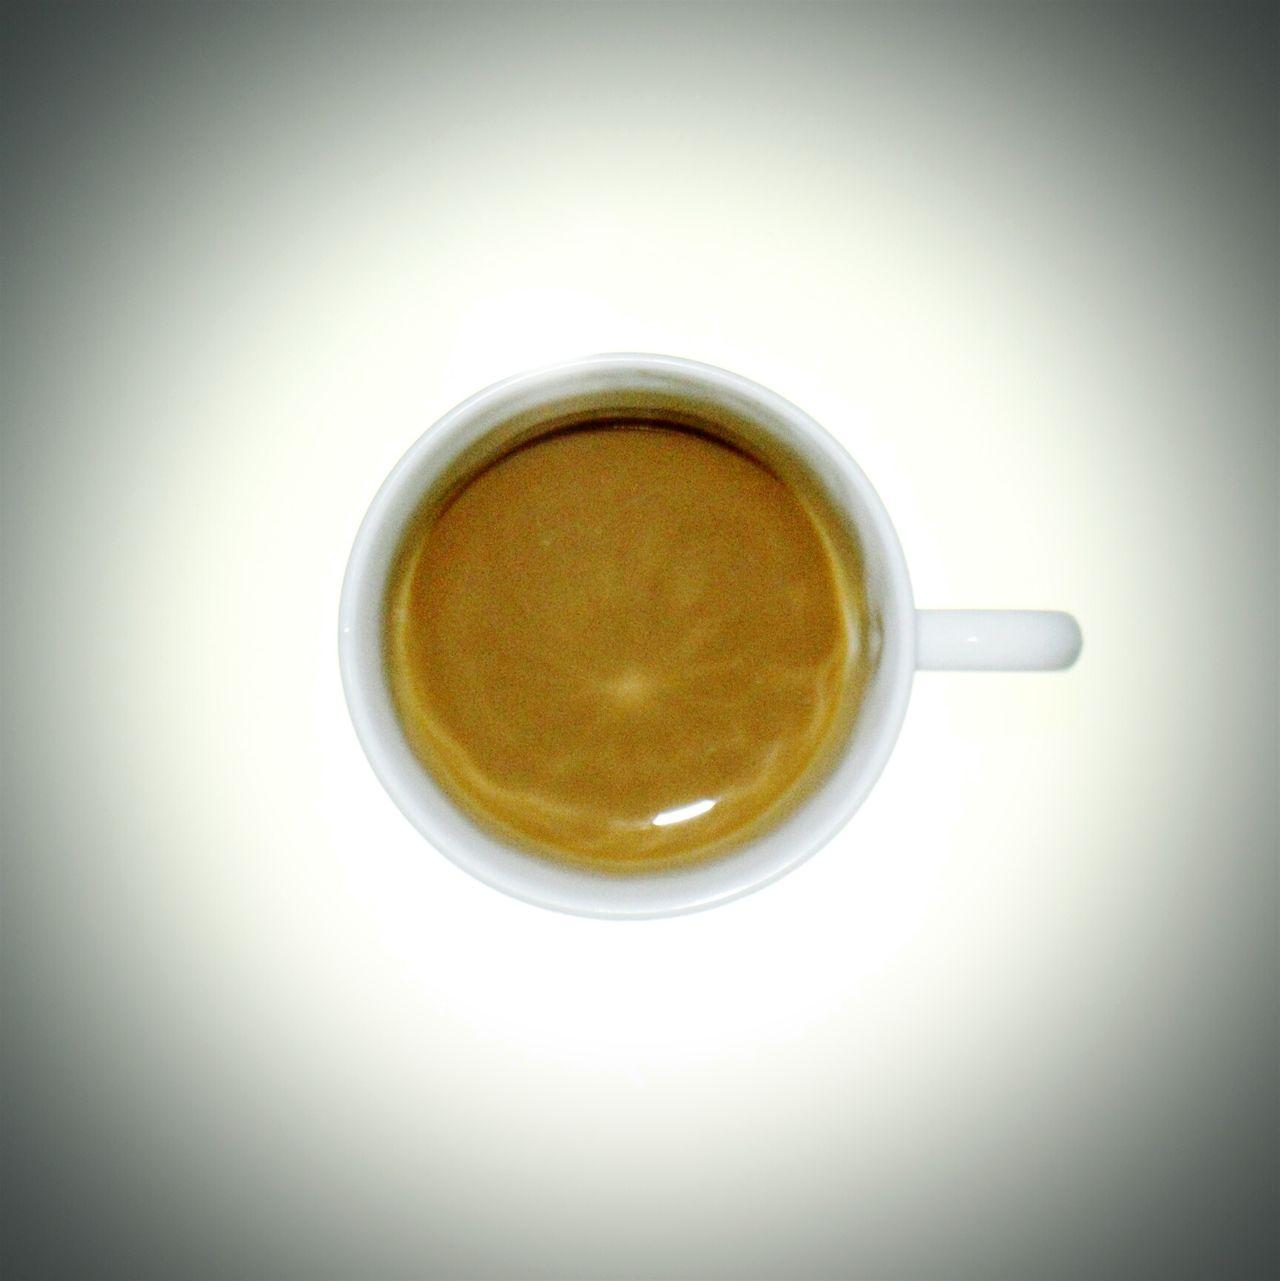 Freelance Life Coffee Coffee Time Coffee ☕ Coffe Koffein Koffee Coffeetime Coffee At Home Morning Good Morning Enjoying Life Freelance Relaxing Taking Photos Enjoying Life New Years Resolutions 2016